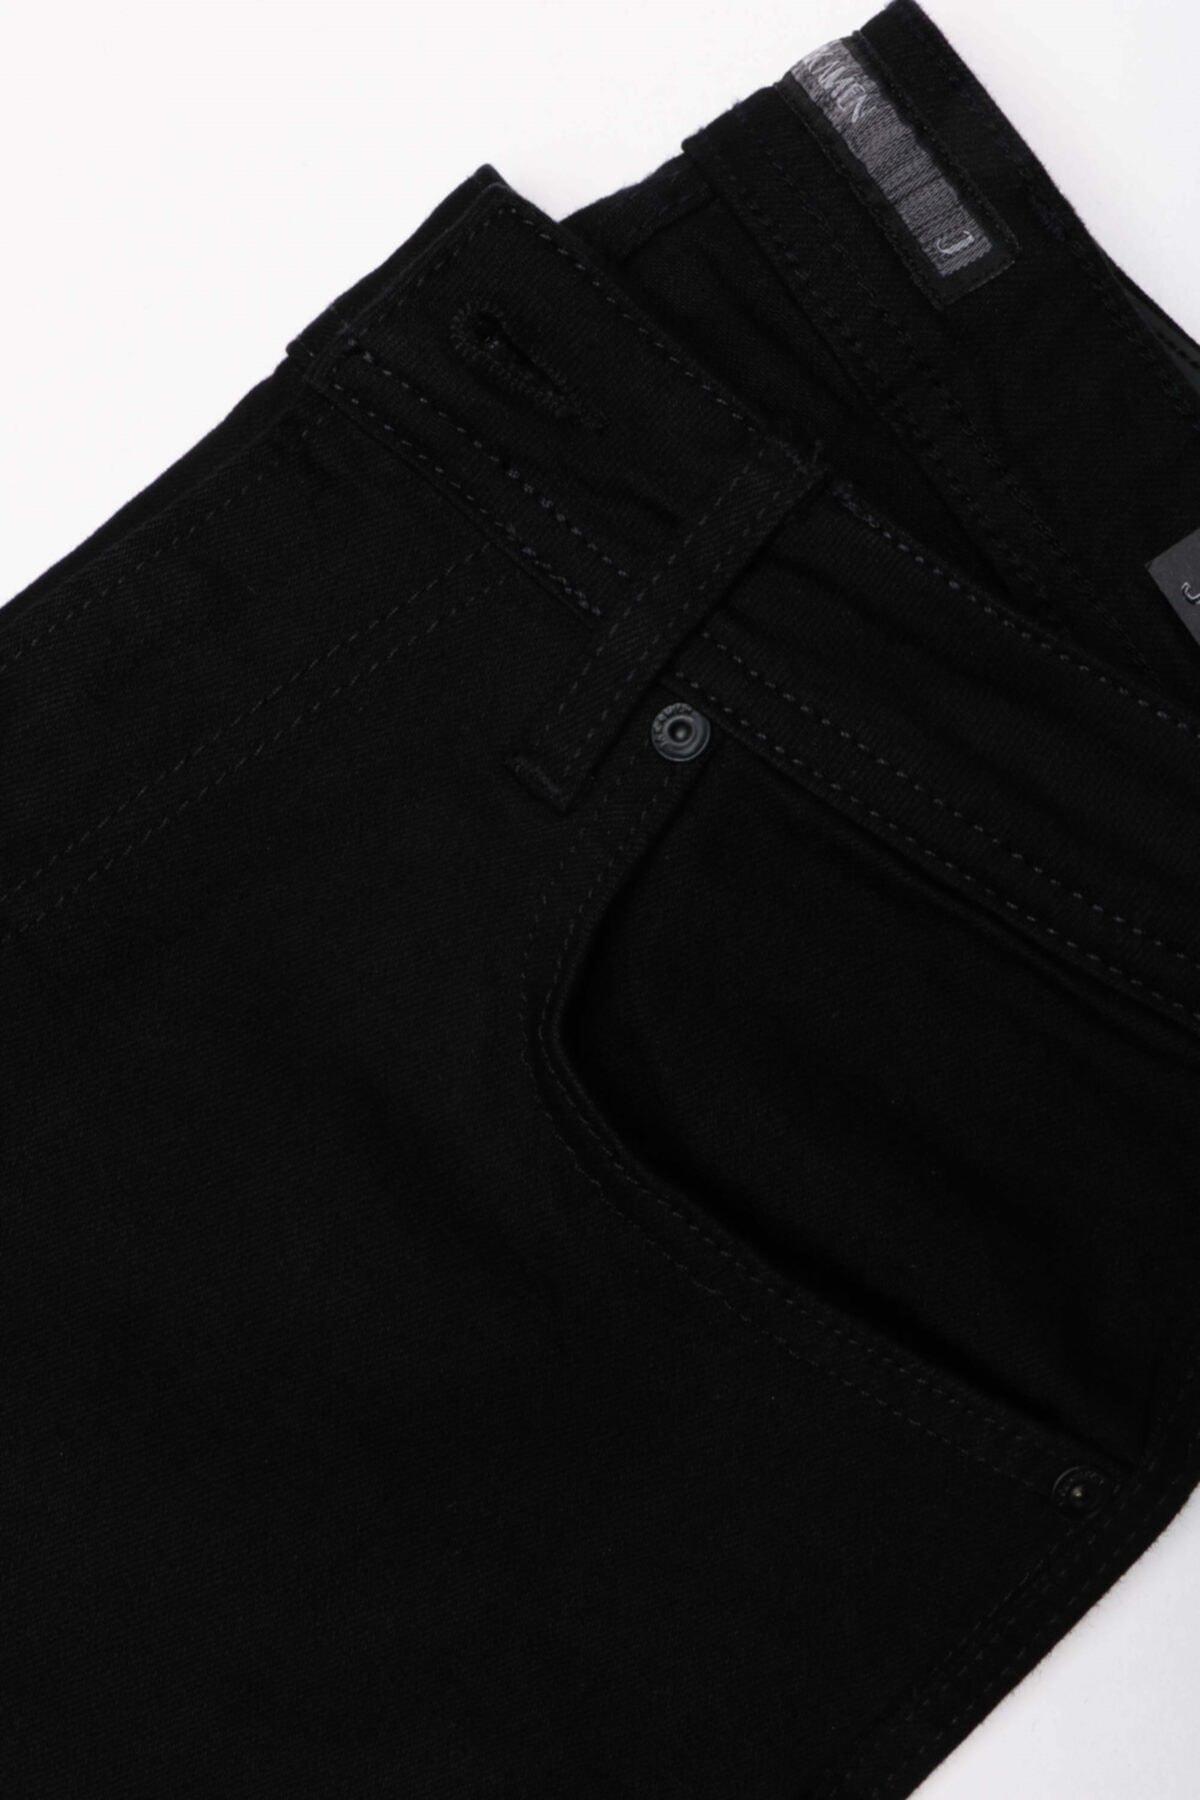 Jakamen Erkek Siyah Slim Beş Cep Jean Pantolon-01 Jk32sf43m025 2